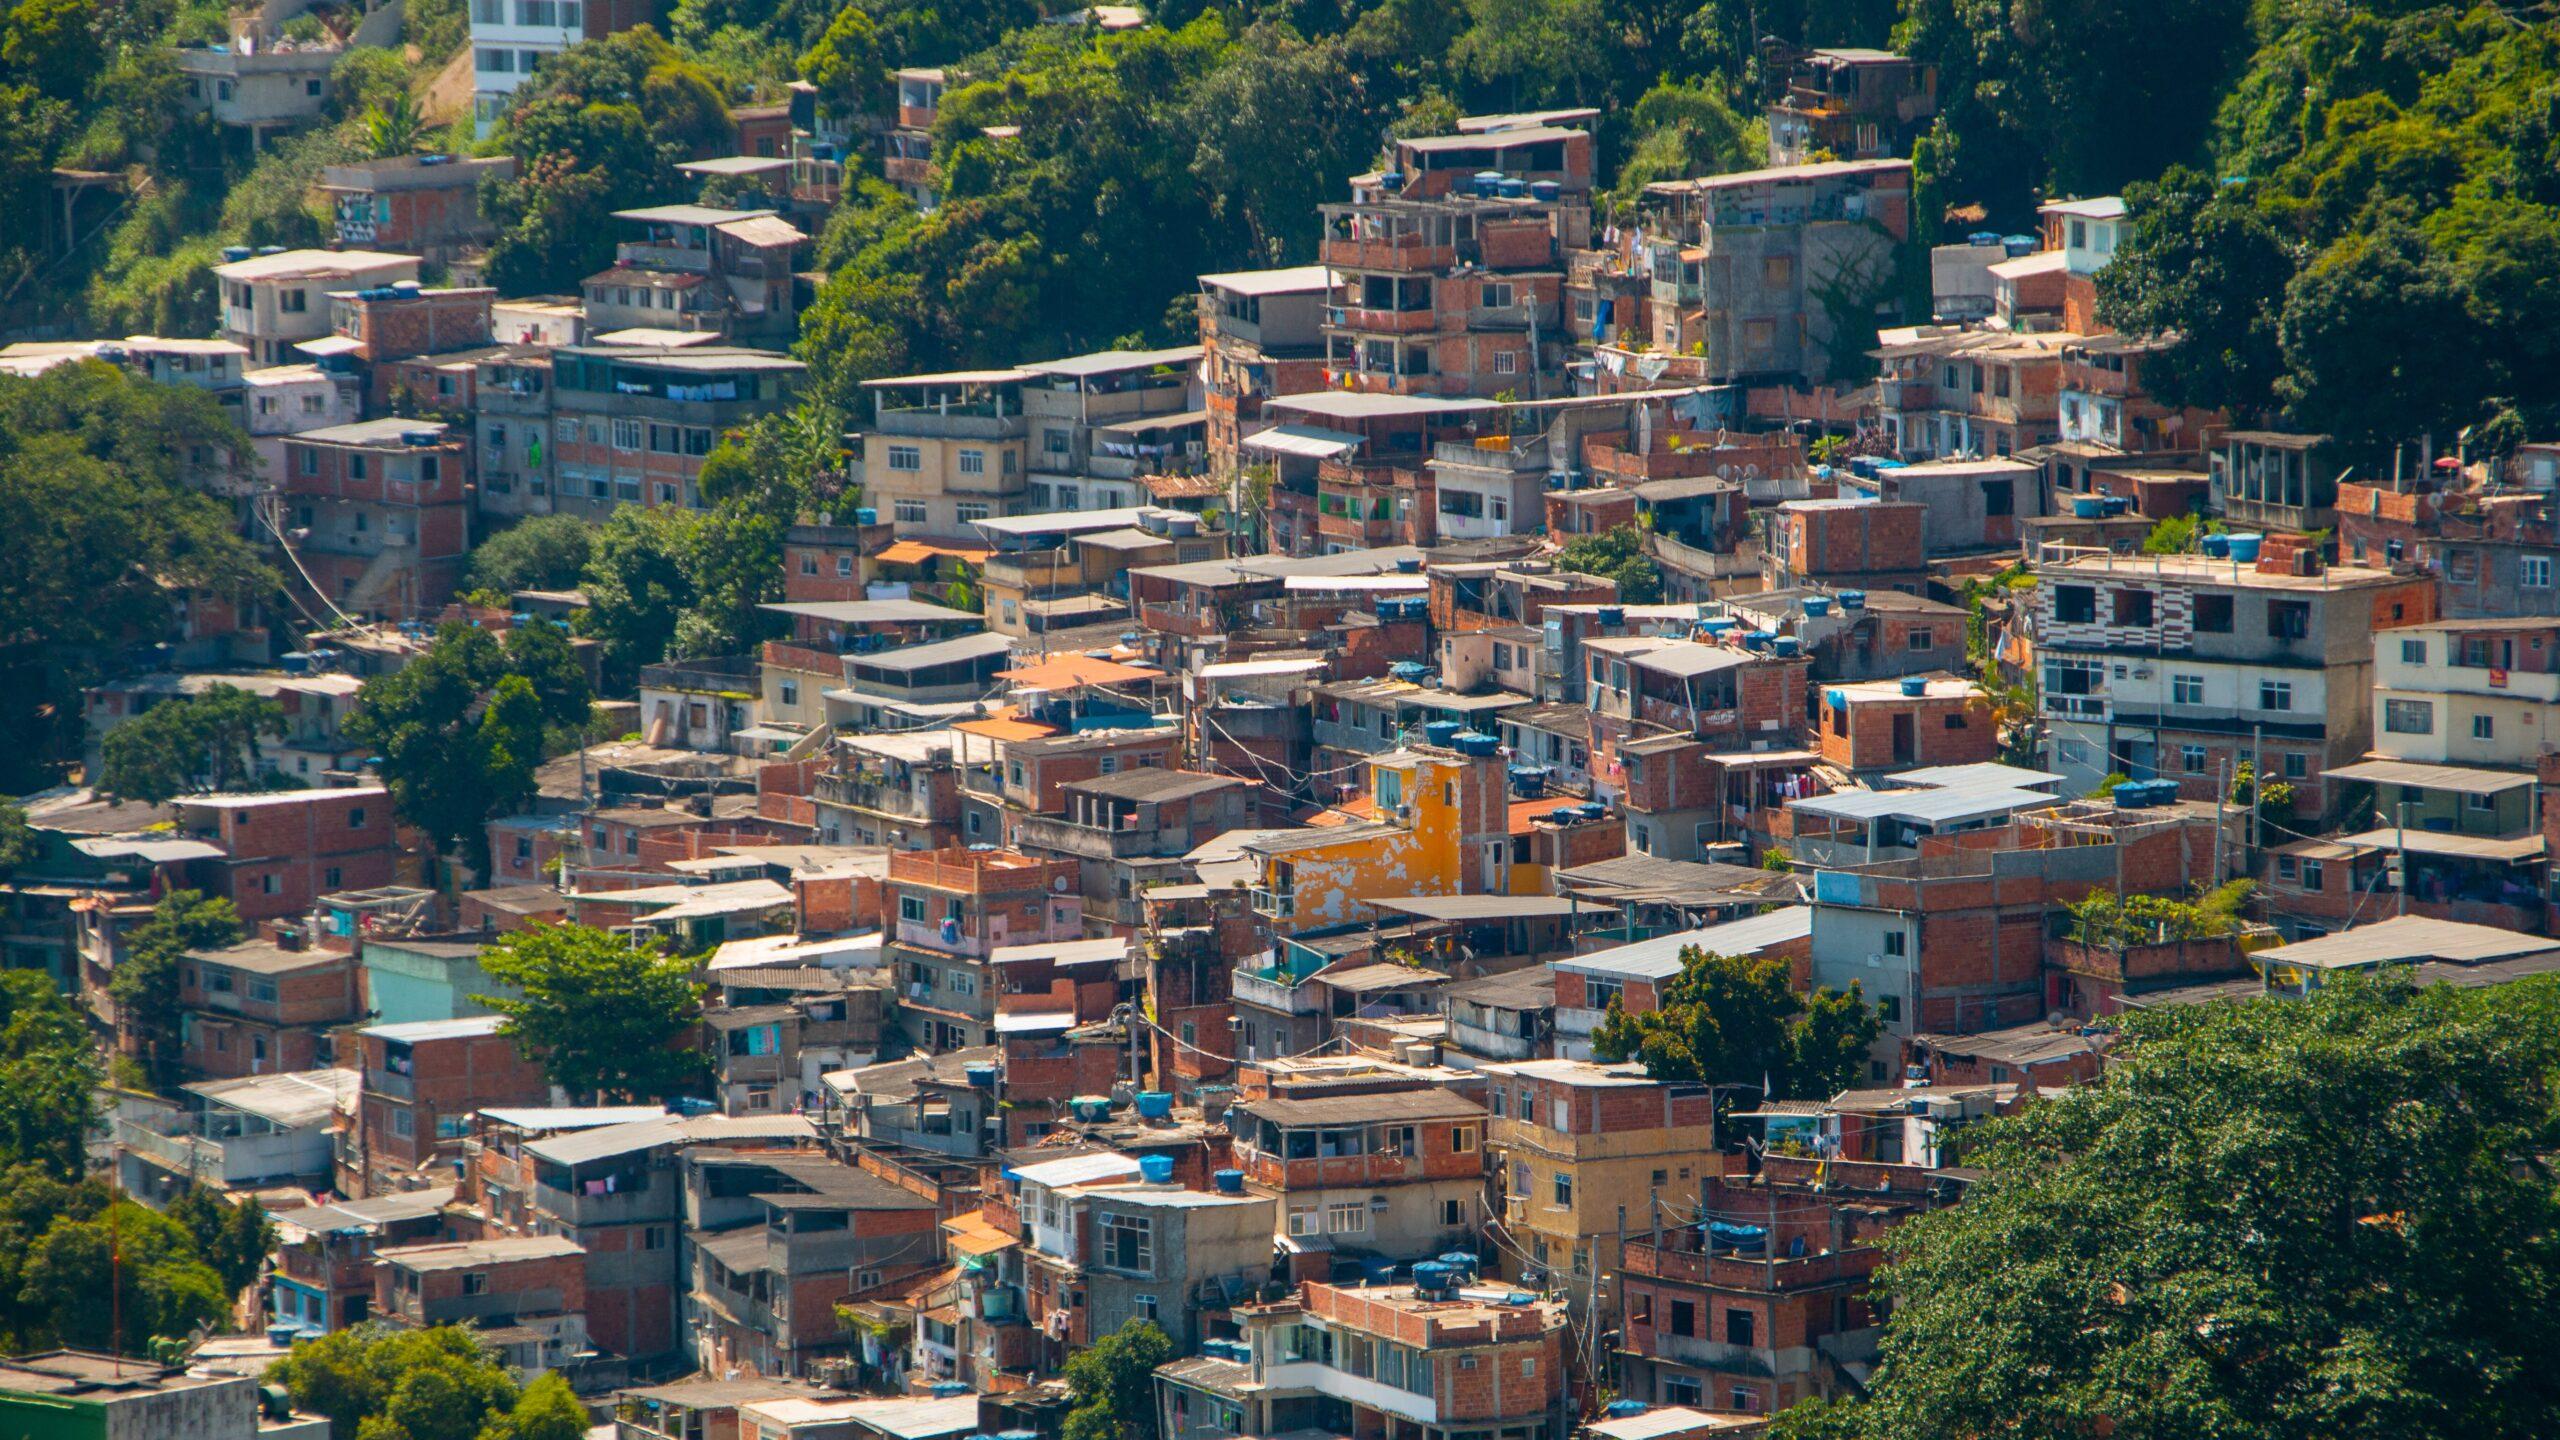 Babylonian slum in Copacabana in Rio de Janeiro Brazil.